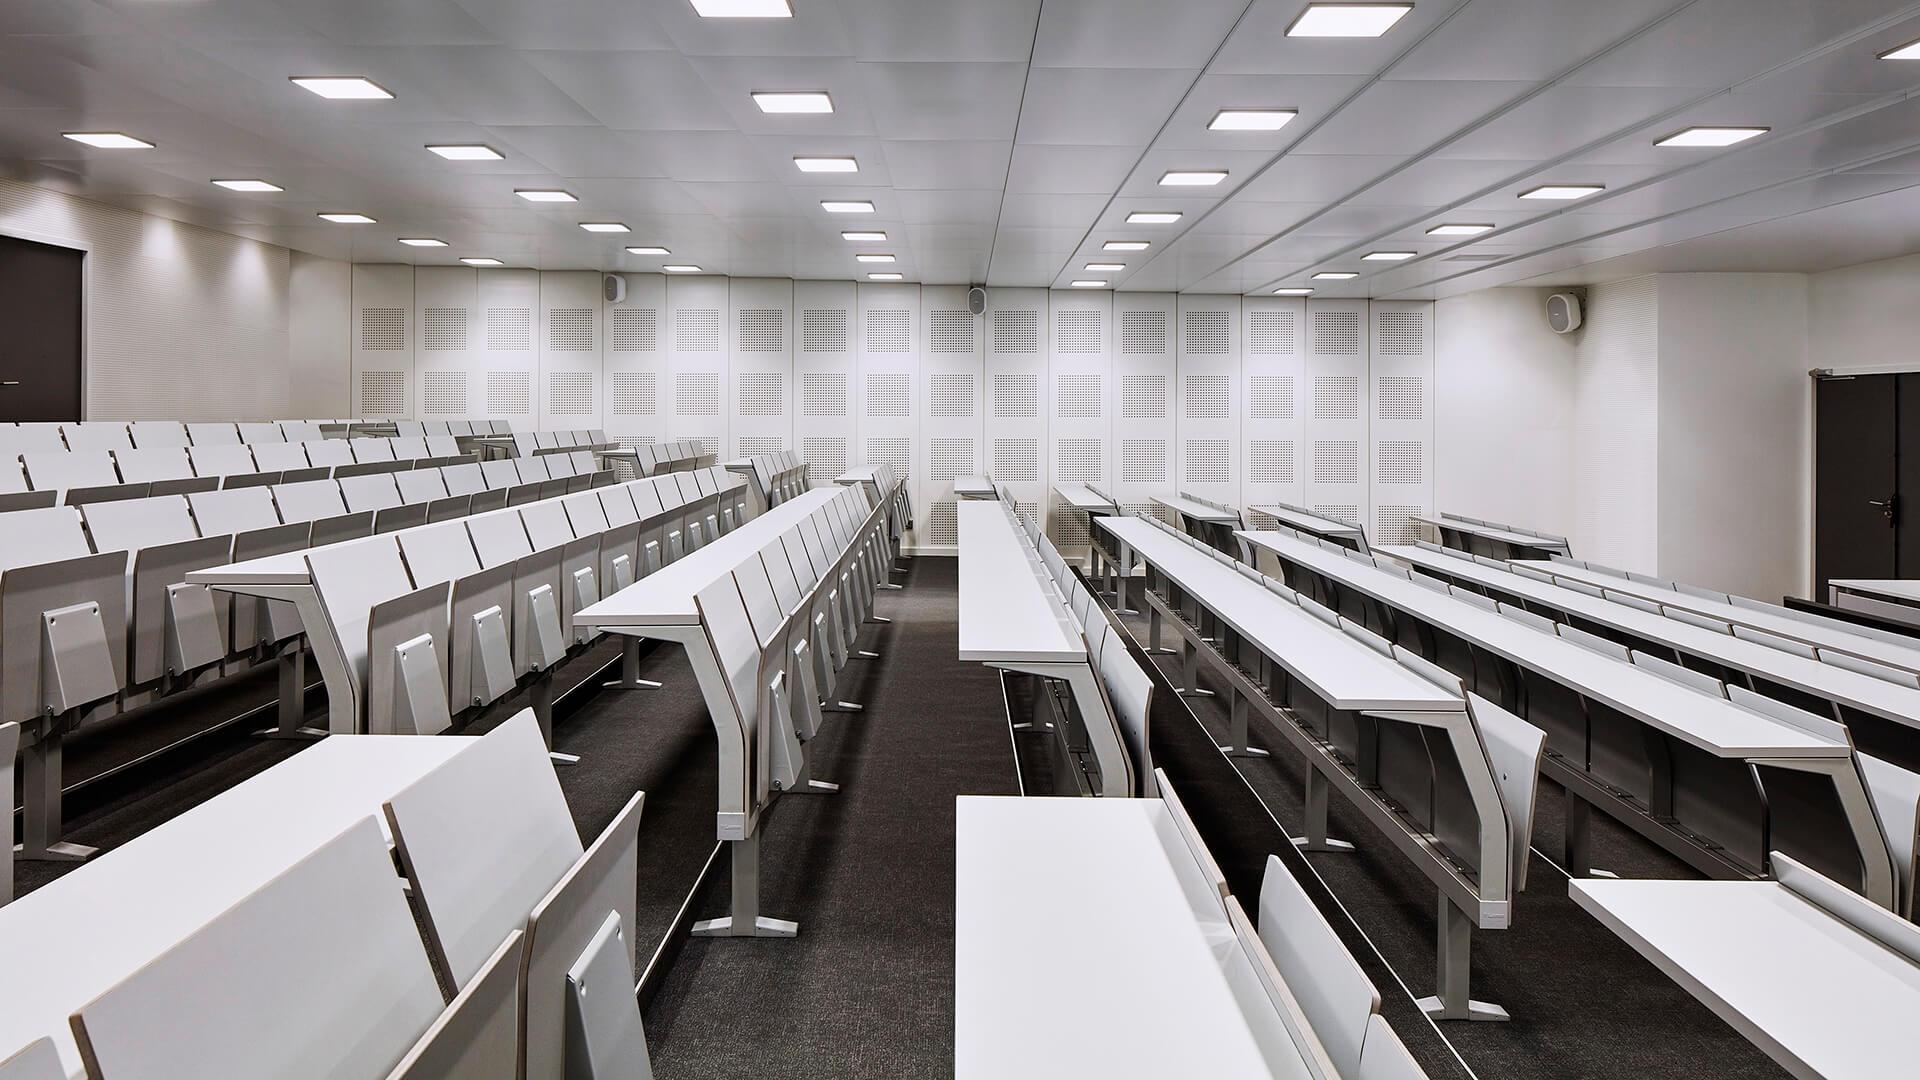 IRA de Lyon - E4000 study bench by LAMM